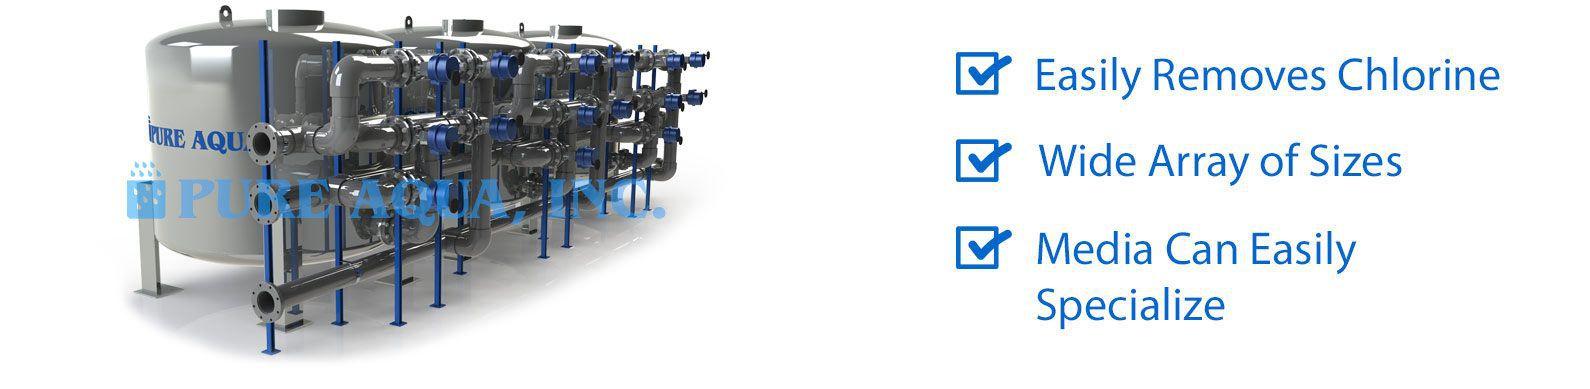 industrial water media filters mf-1100 series features